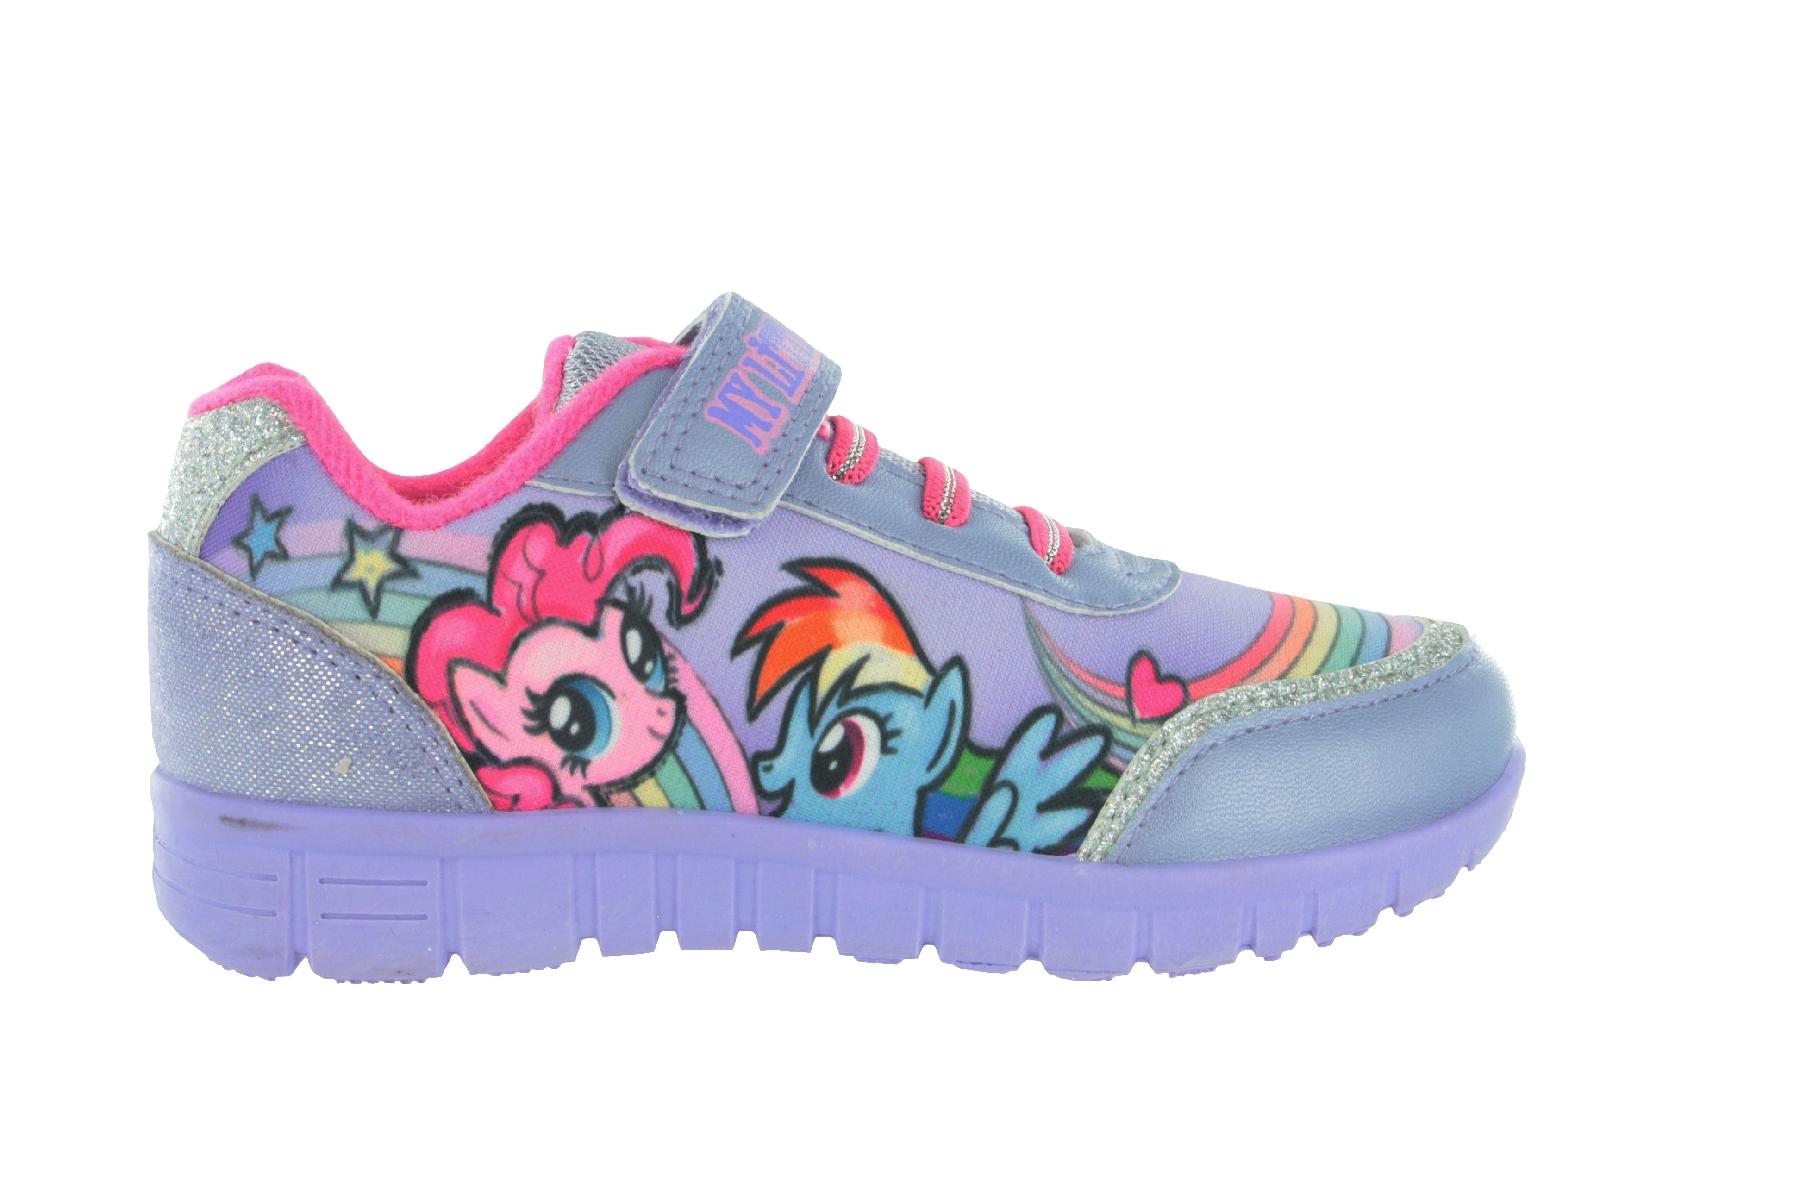 new products 14aba 0a2cd Dettagli su Ragazze Mlp My Little Pony Lilla Scarpe Sportive Gancio & Ciclo  Taglie UK 6 - 12